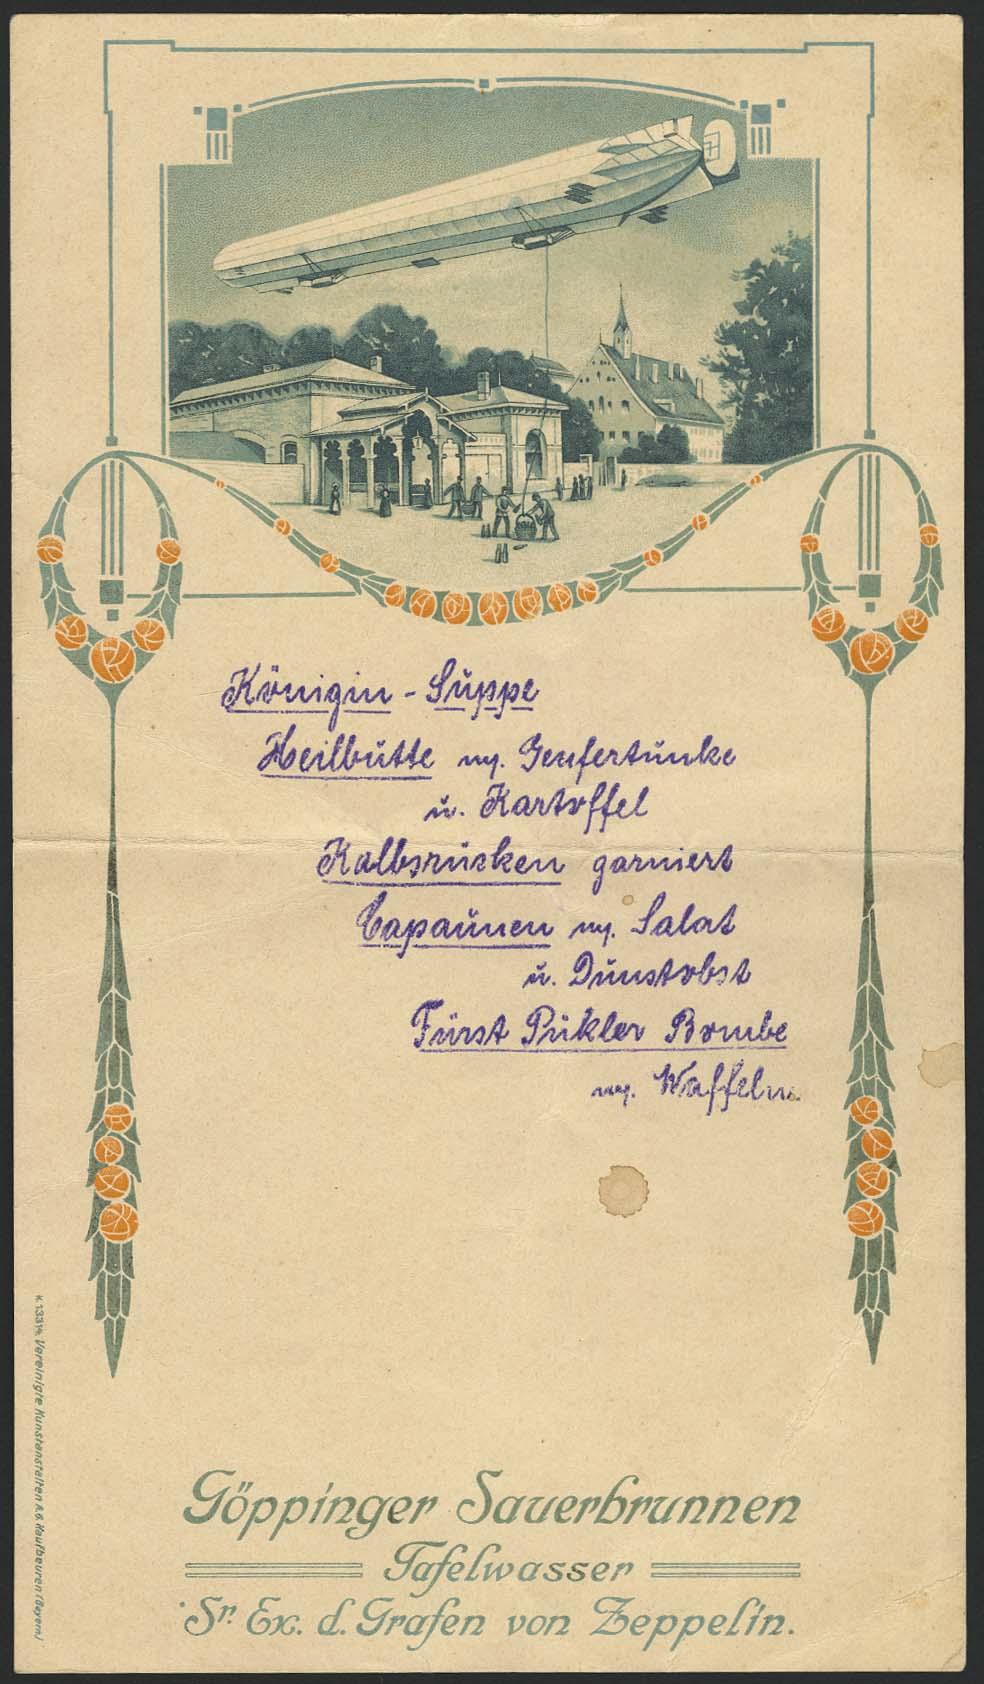 Lot 4110 - Zeppelin-Memorabilien Memorabilien -  Auktionshaus Ulrich Felzmann GmbH & Co. KG